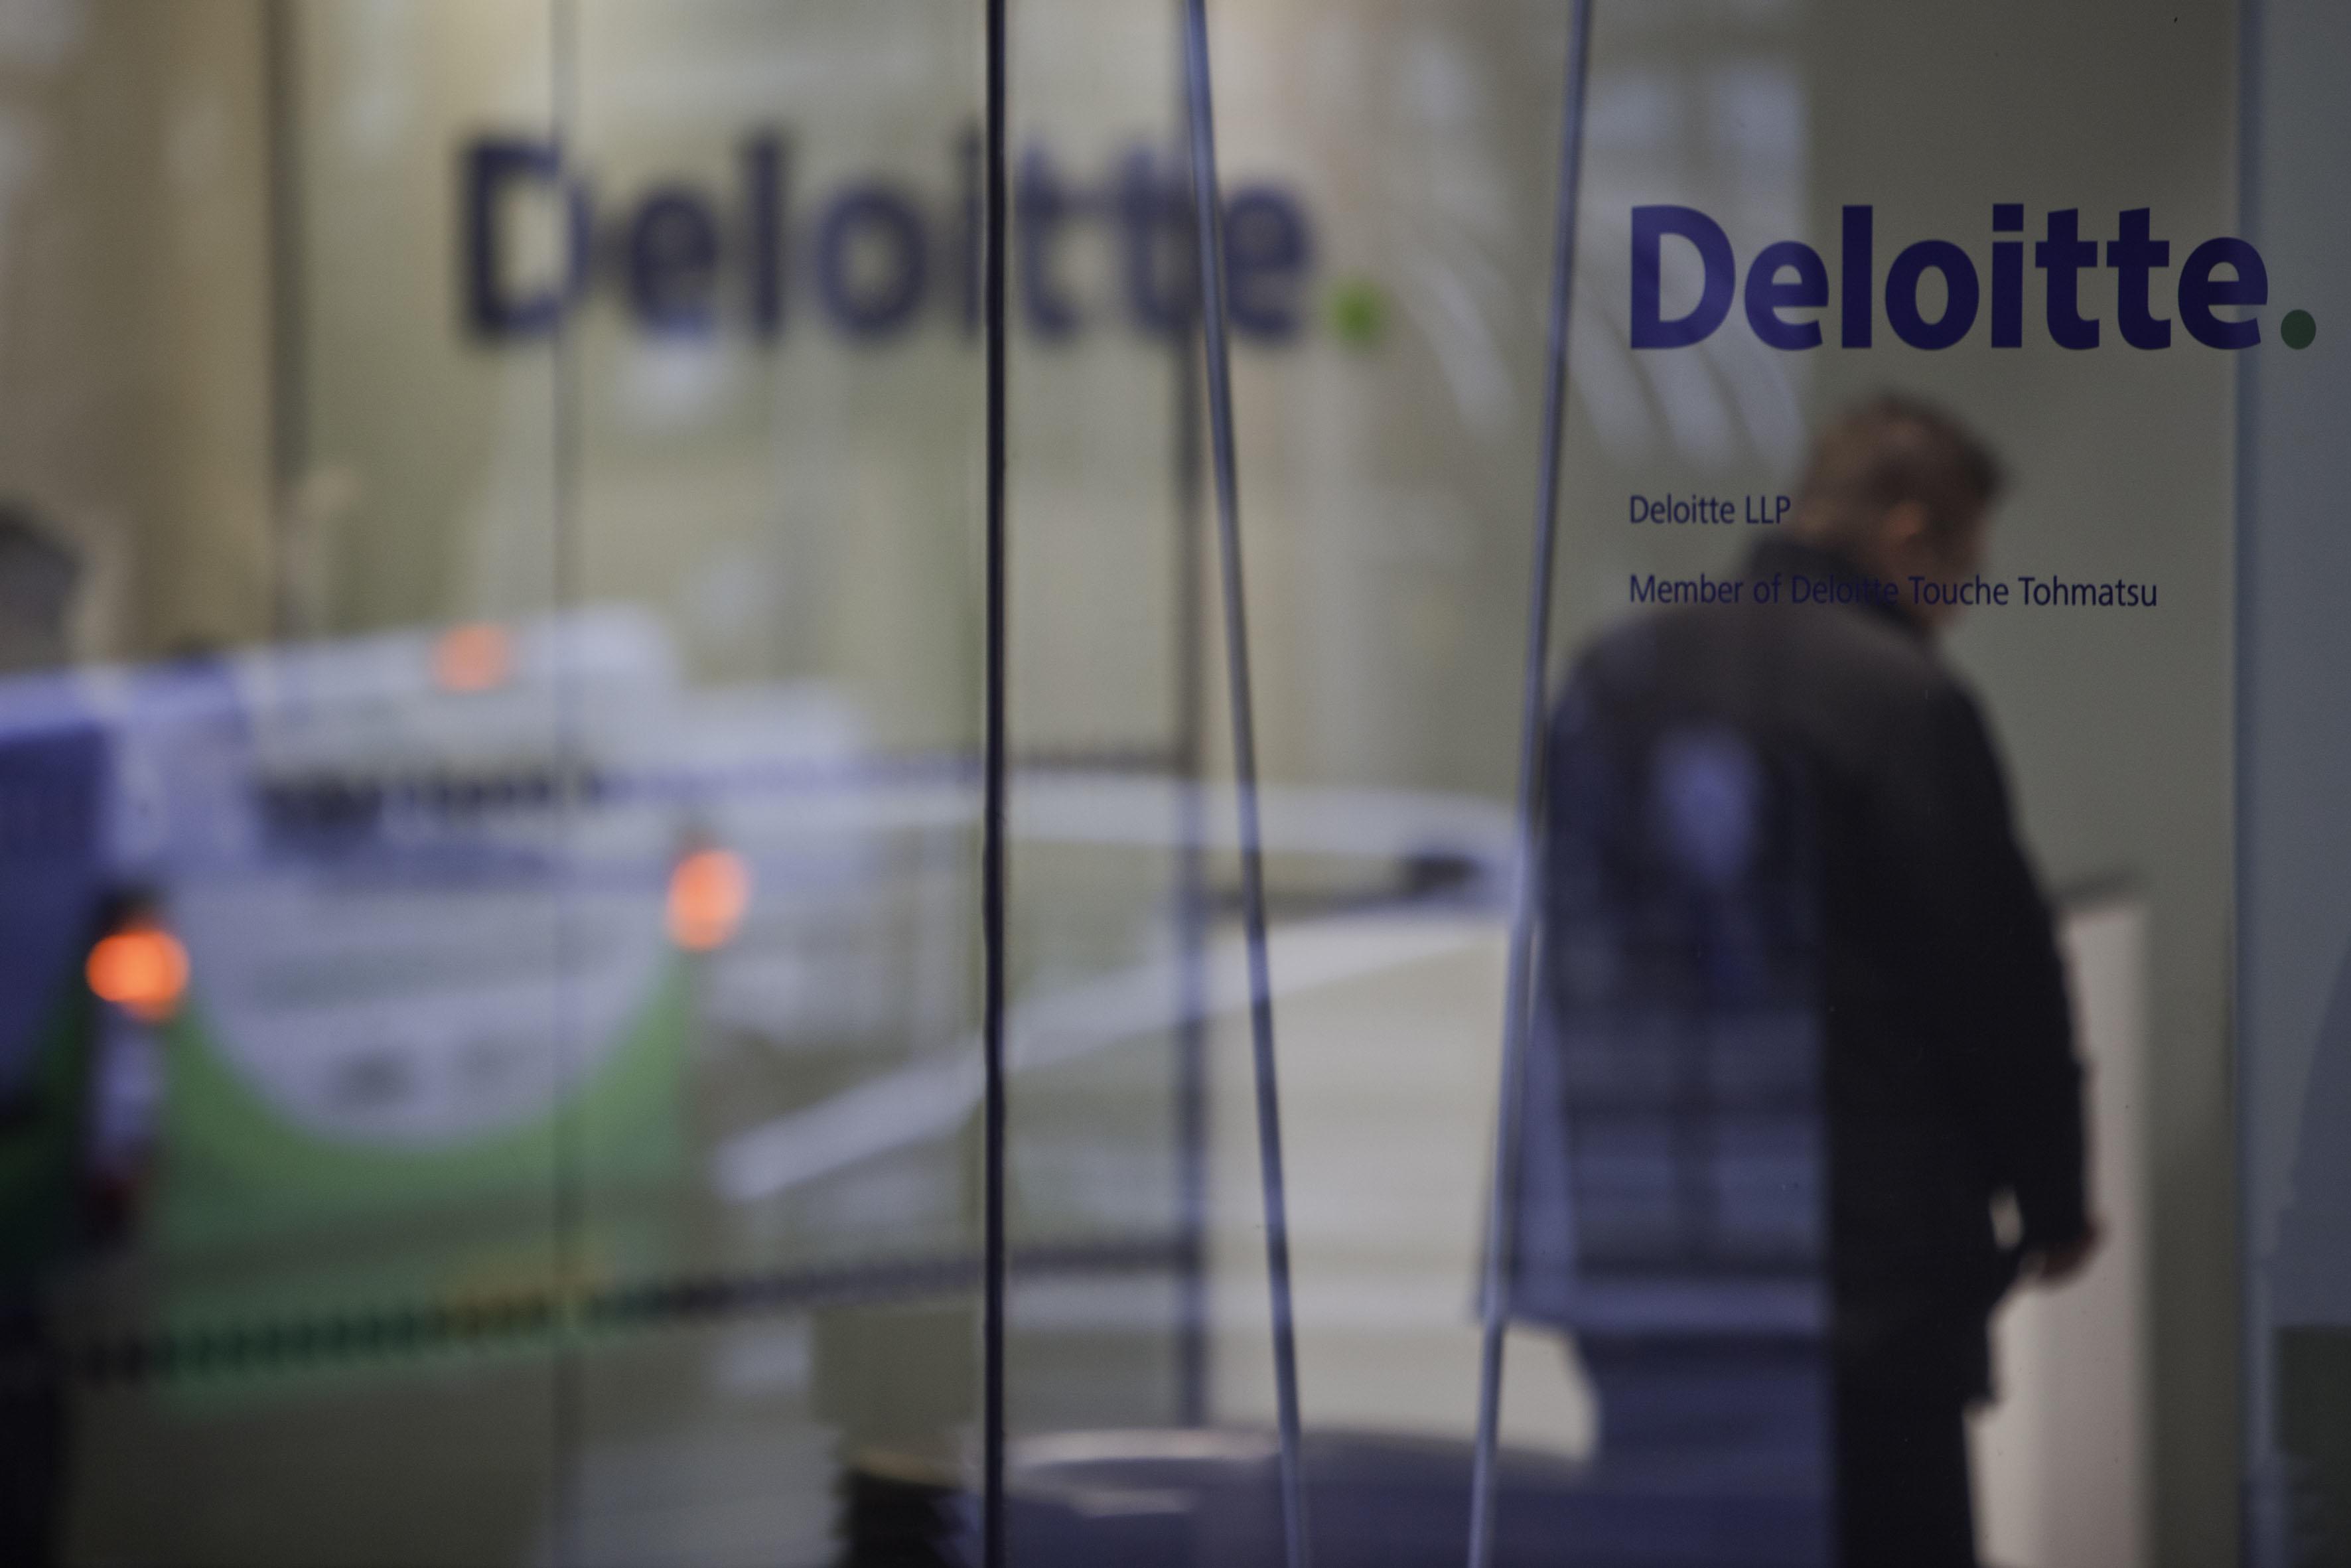 United Kingdom - London - Deloitte